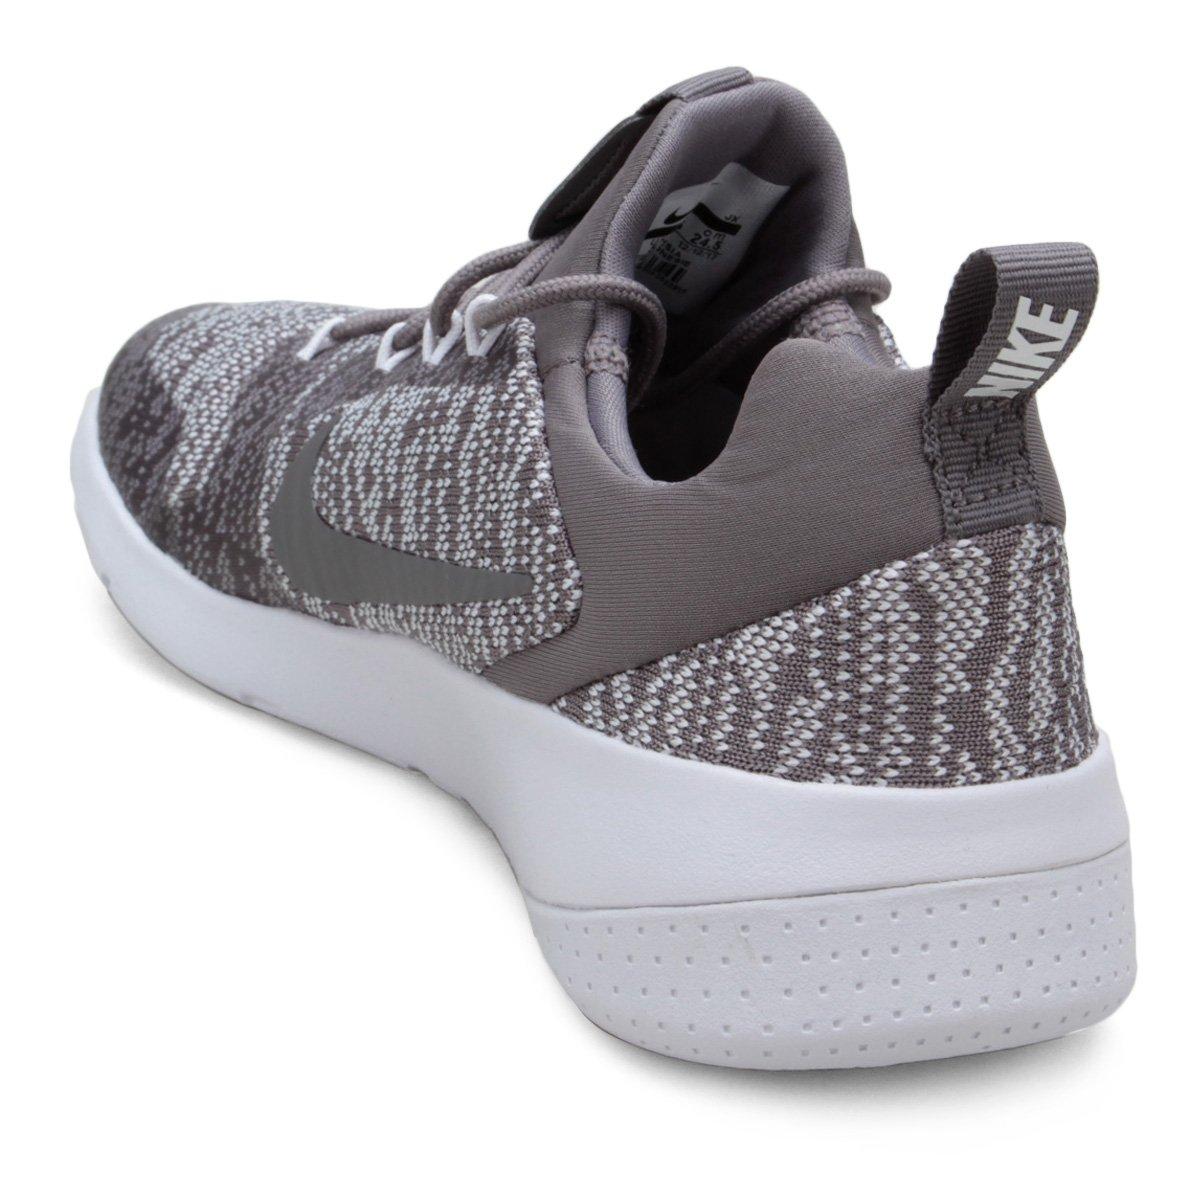 b4d8683cbd Tênis Nike Ck Racer - Cinza - Compre Agora